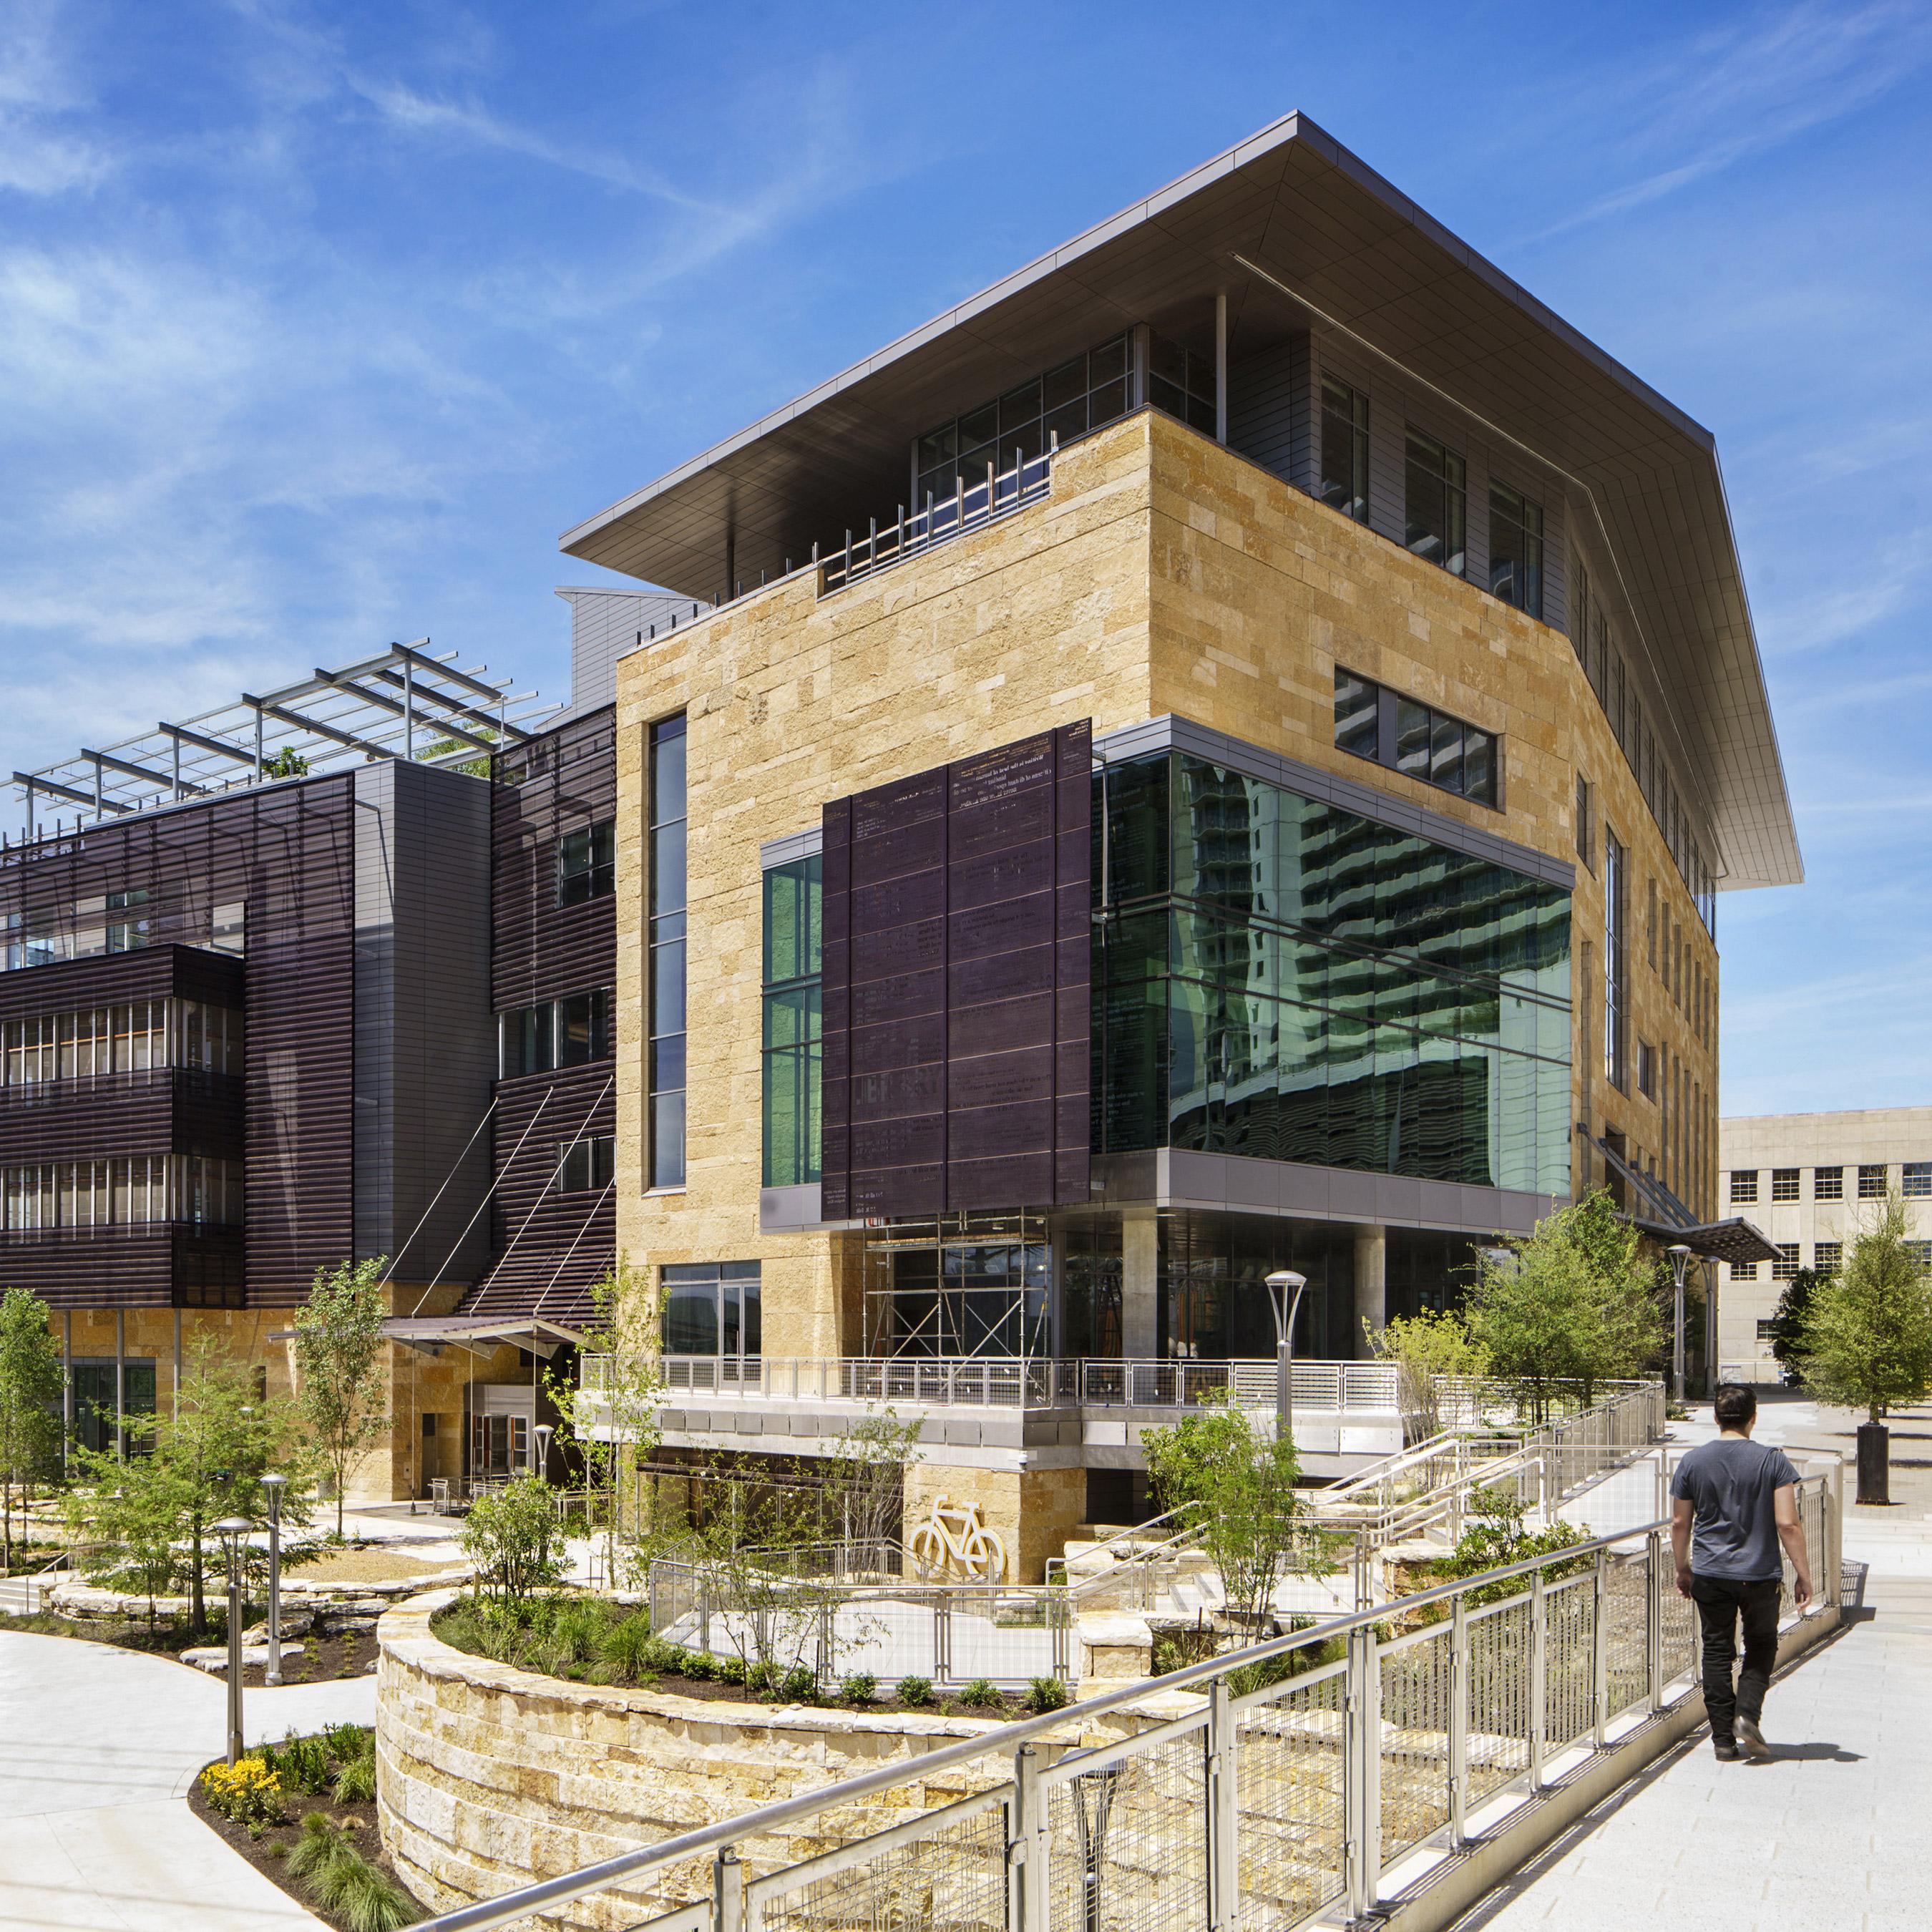 Austin Public Library and Second Street Bridge